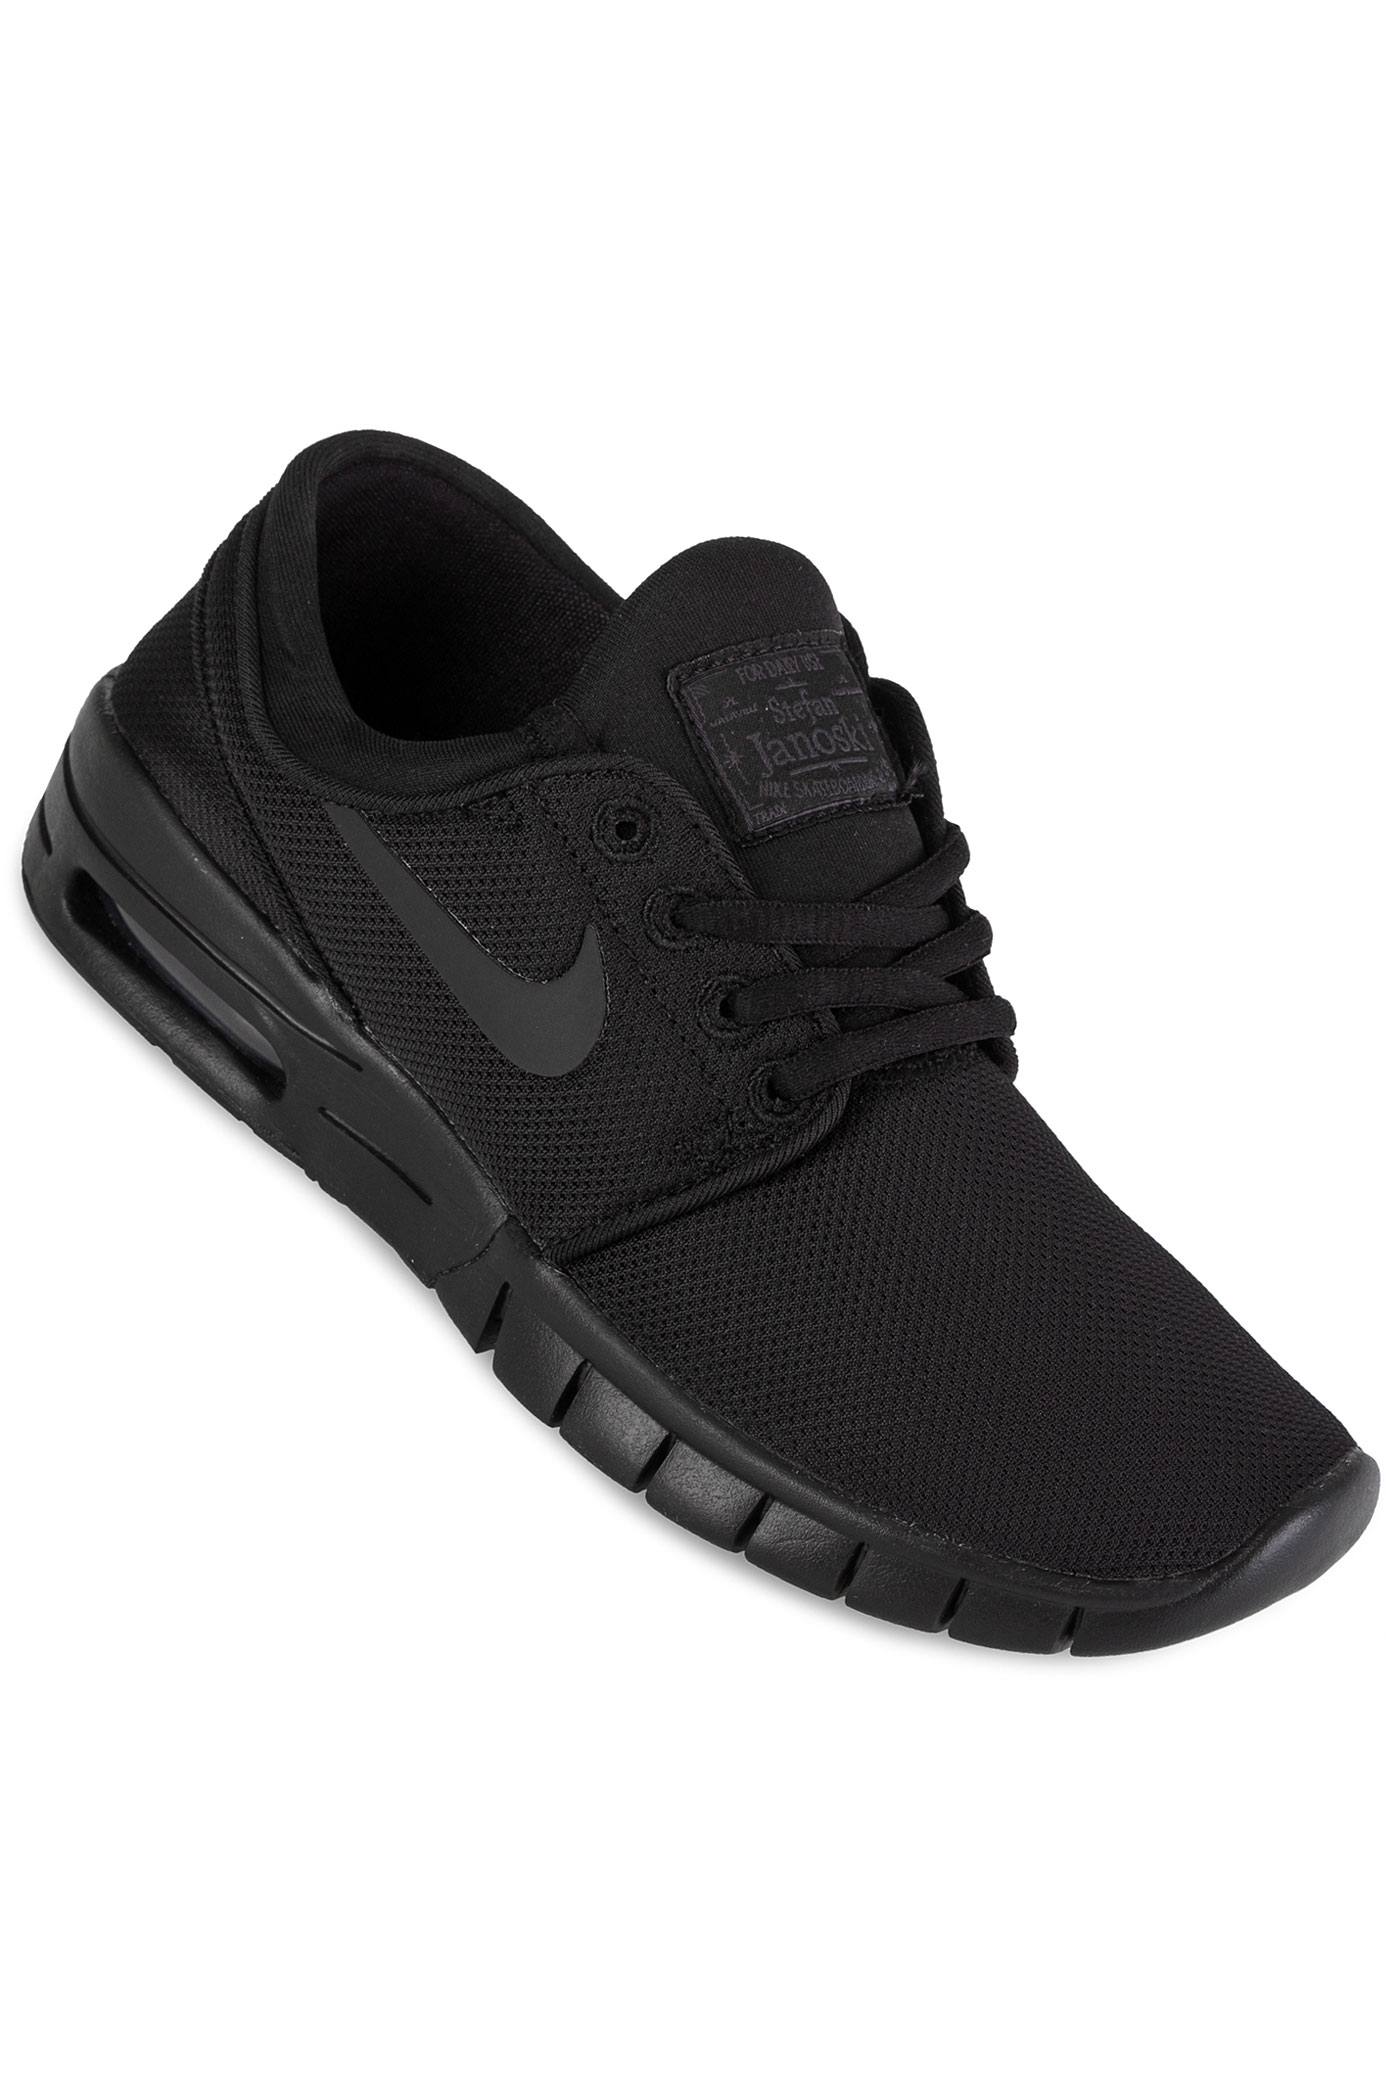 nike sb stefan janoski max chaussure kids black black black achetez sur skatedeluxe. Black Bedroom Furniture Sets. Home Design Ideas